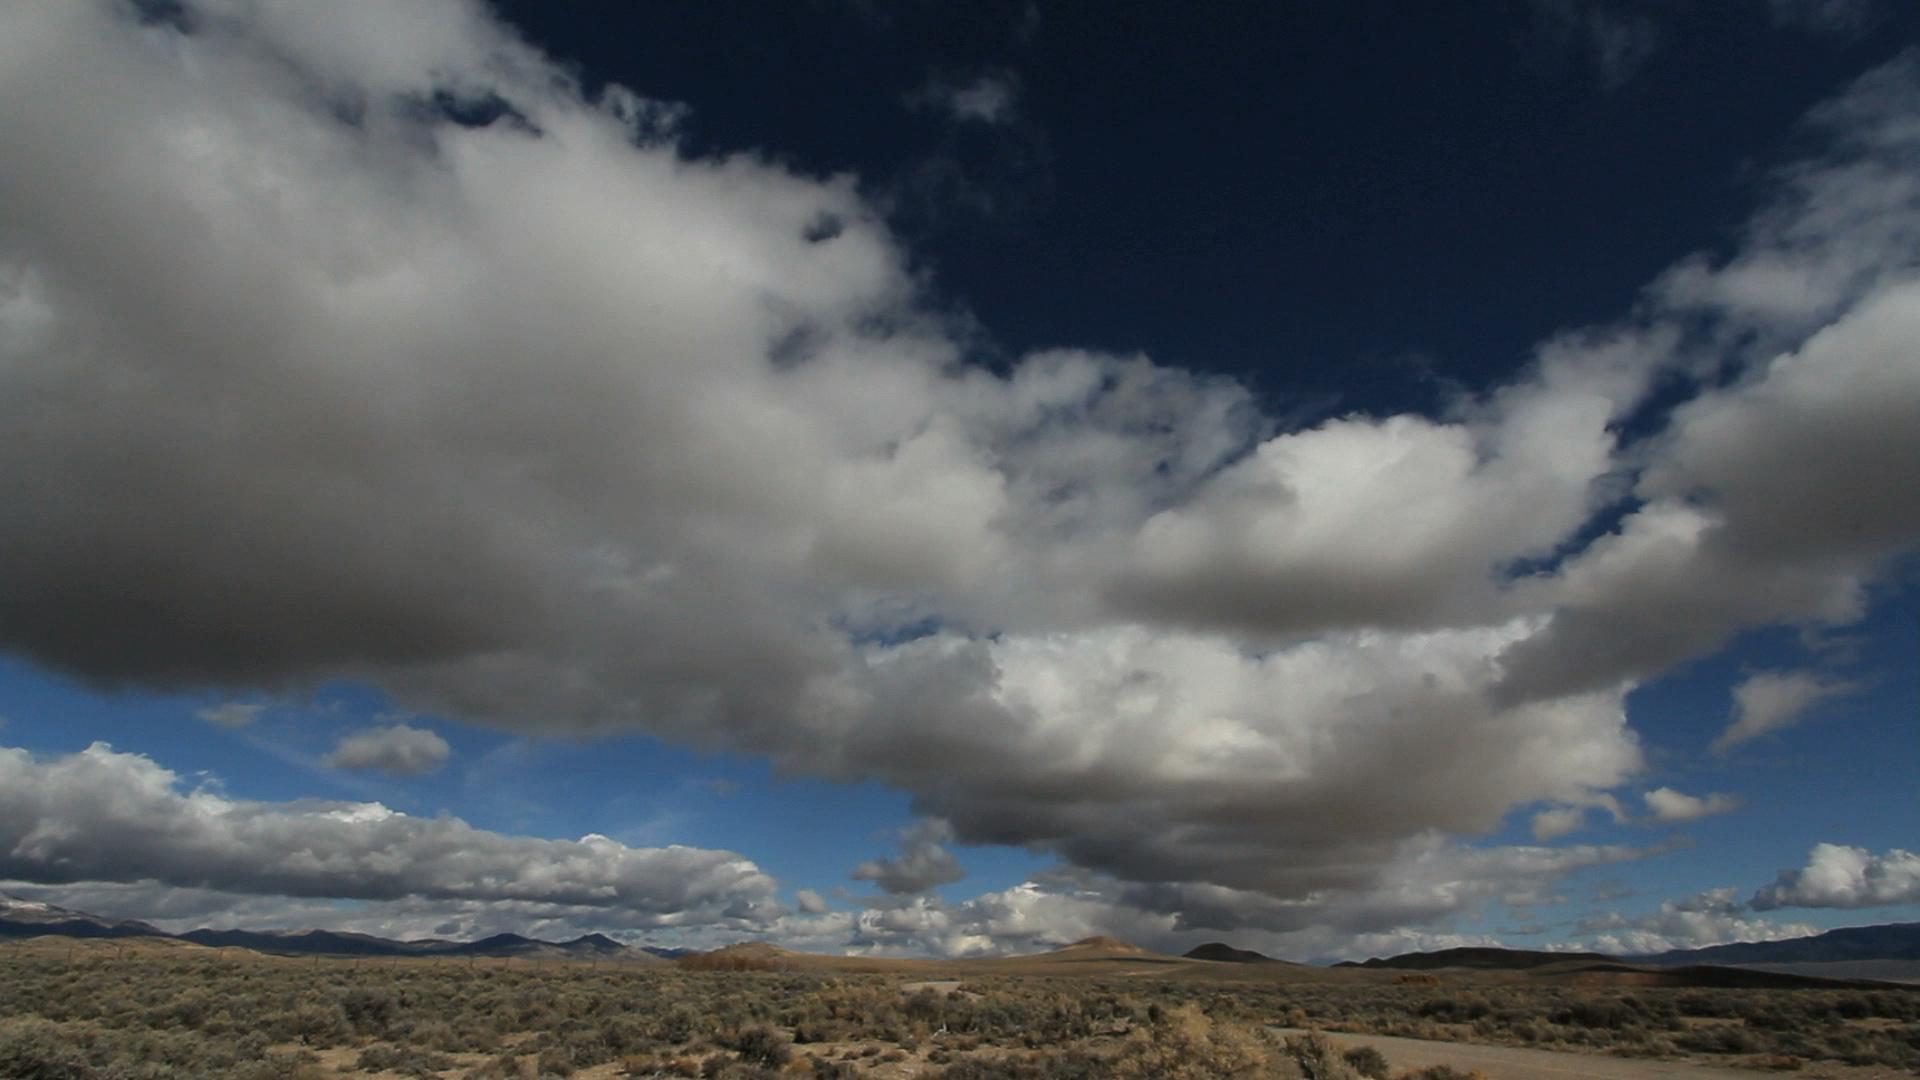 Low Clouds Rolling Across Barren Landscape 2 Unlimited